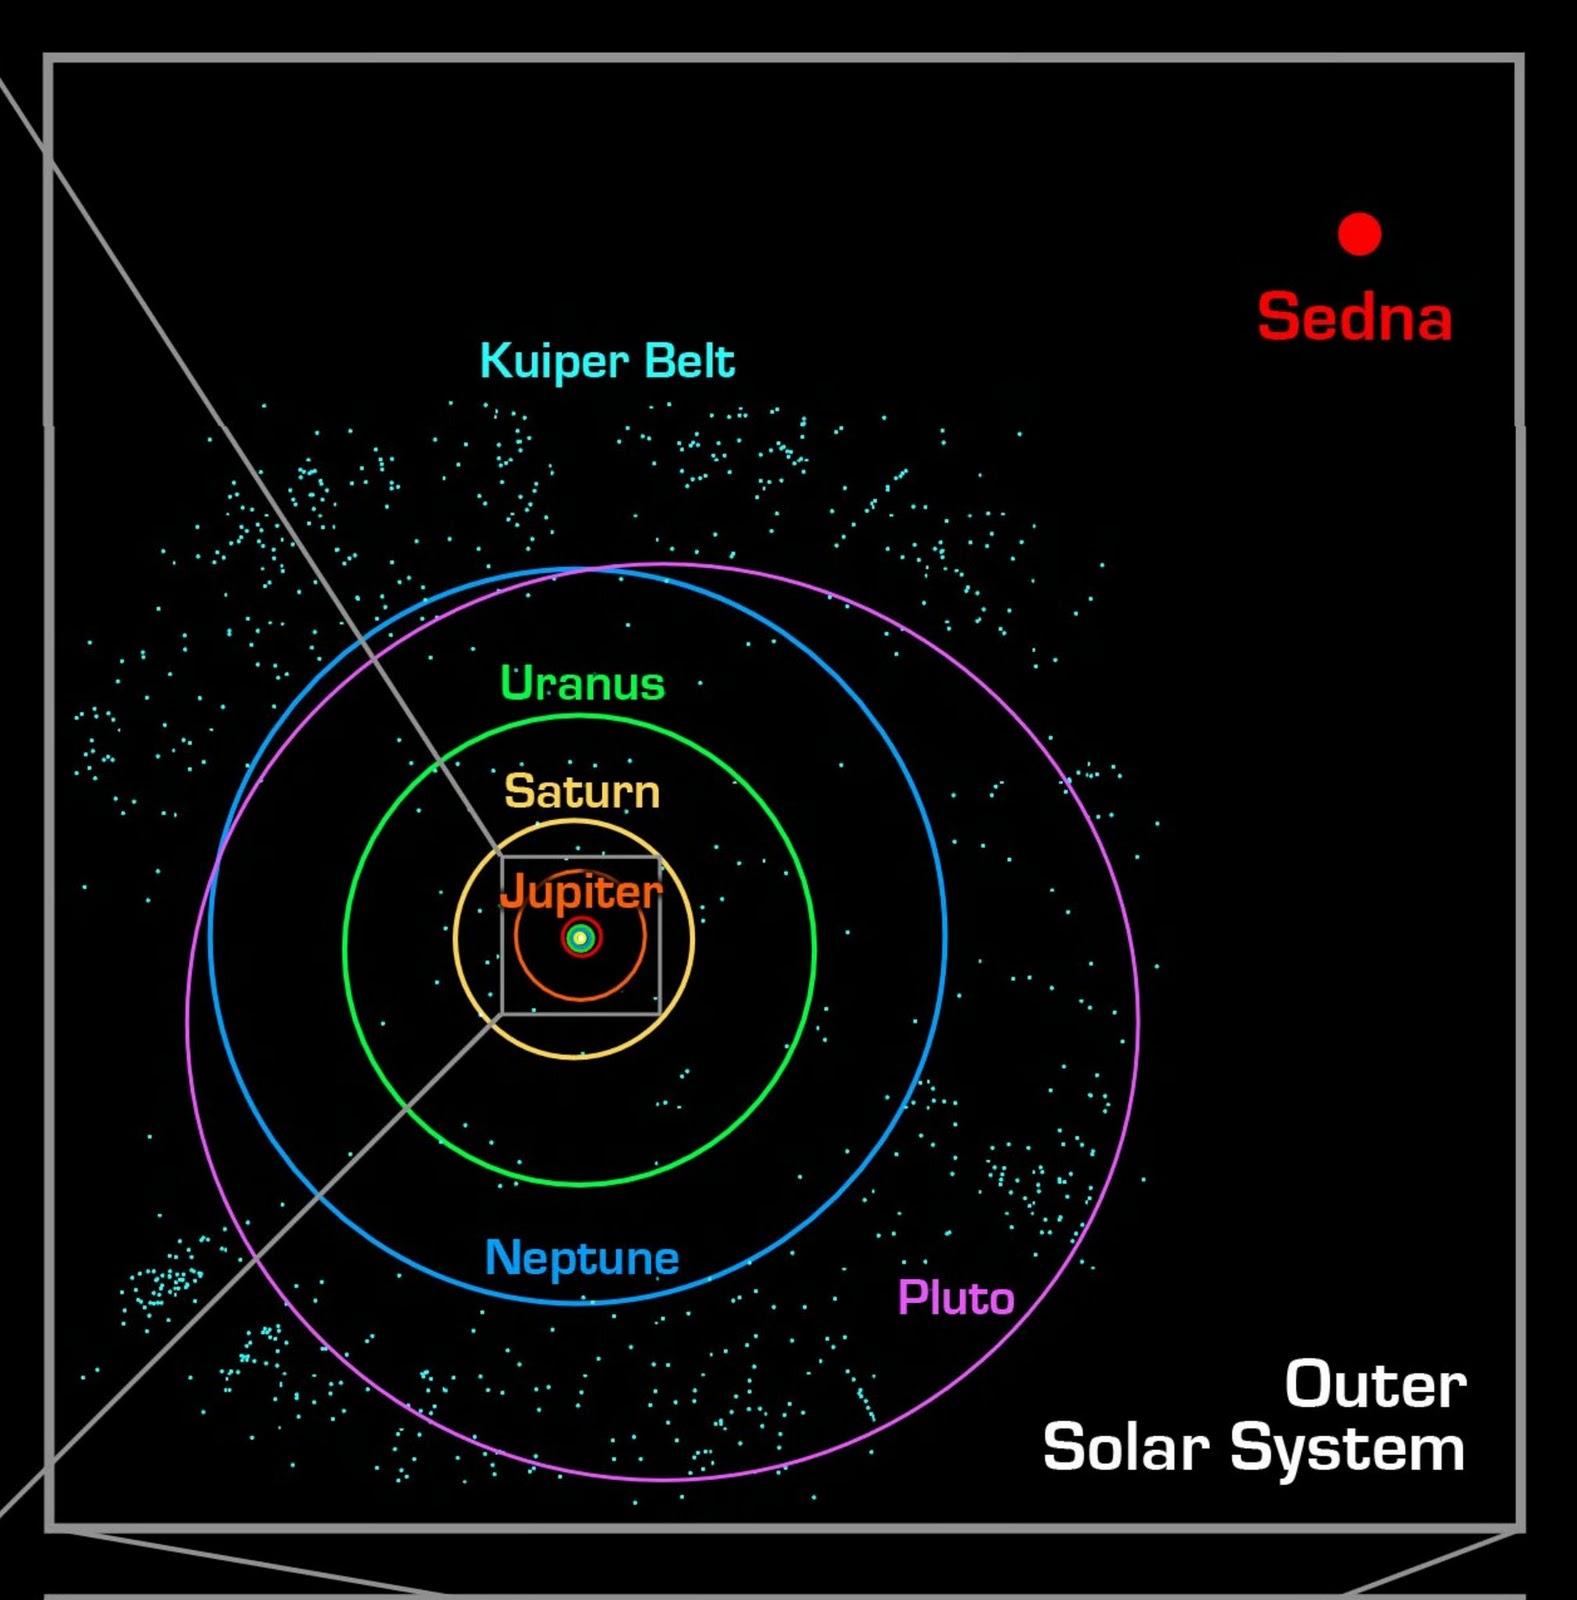 planets solar system diagram - photo #18